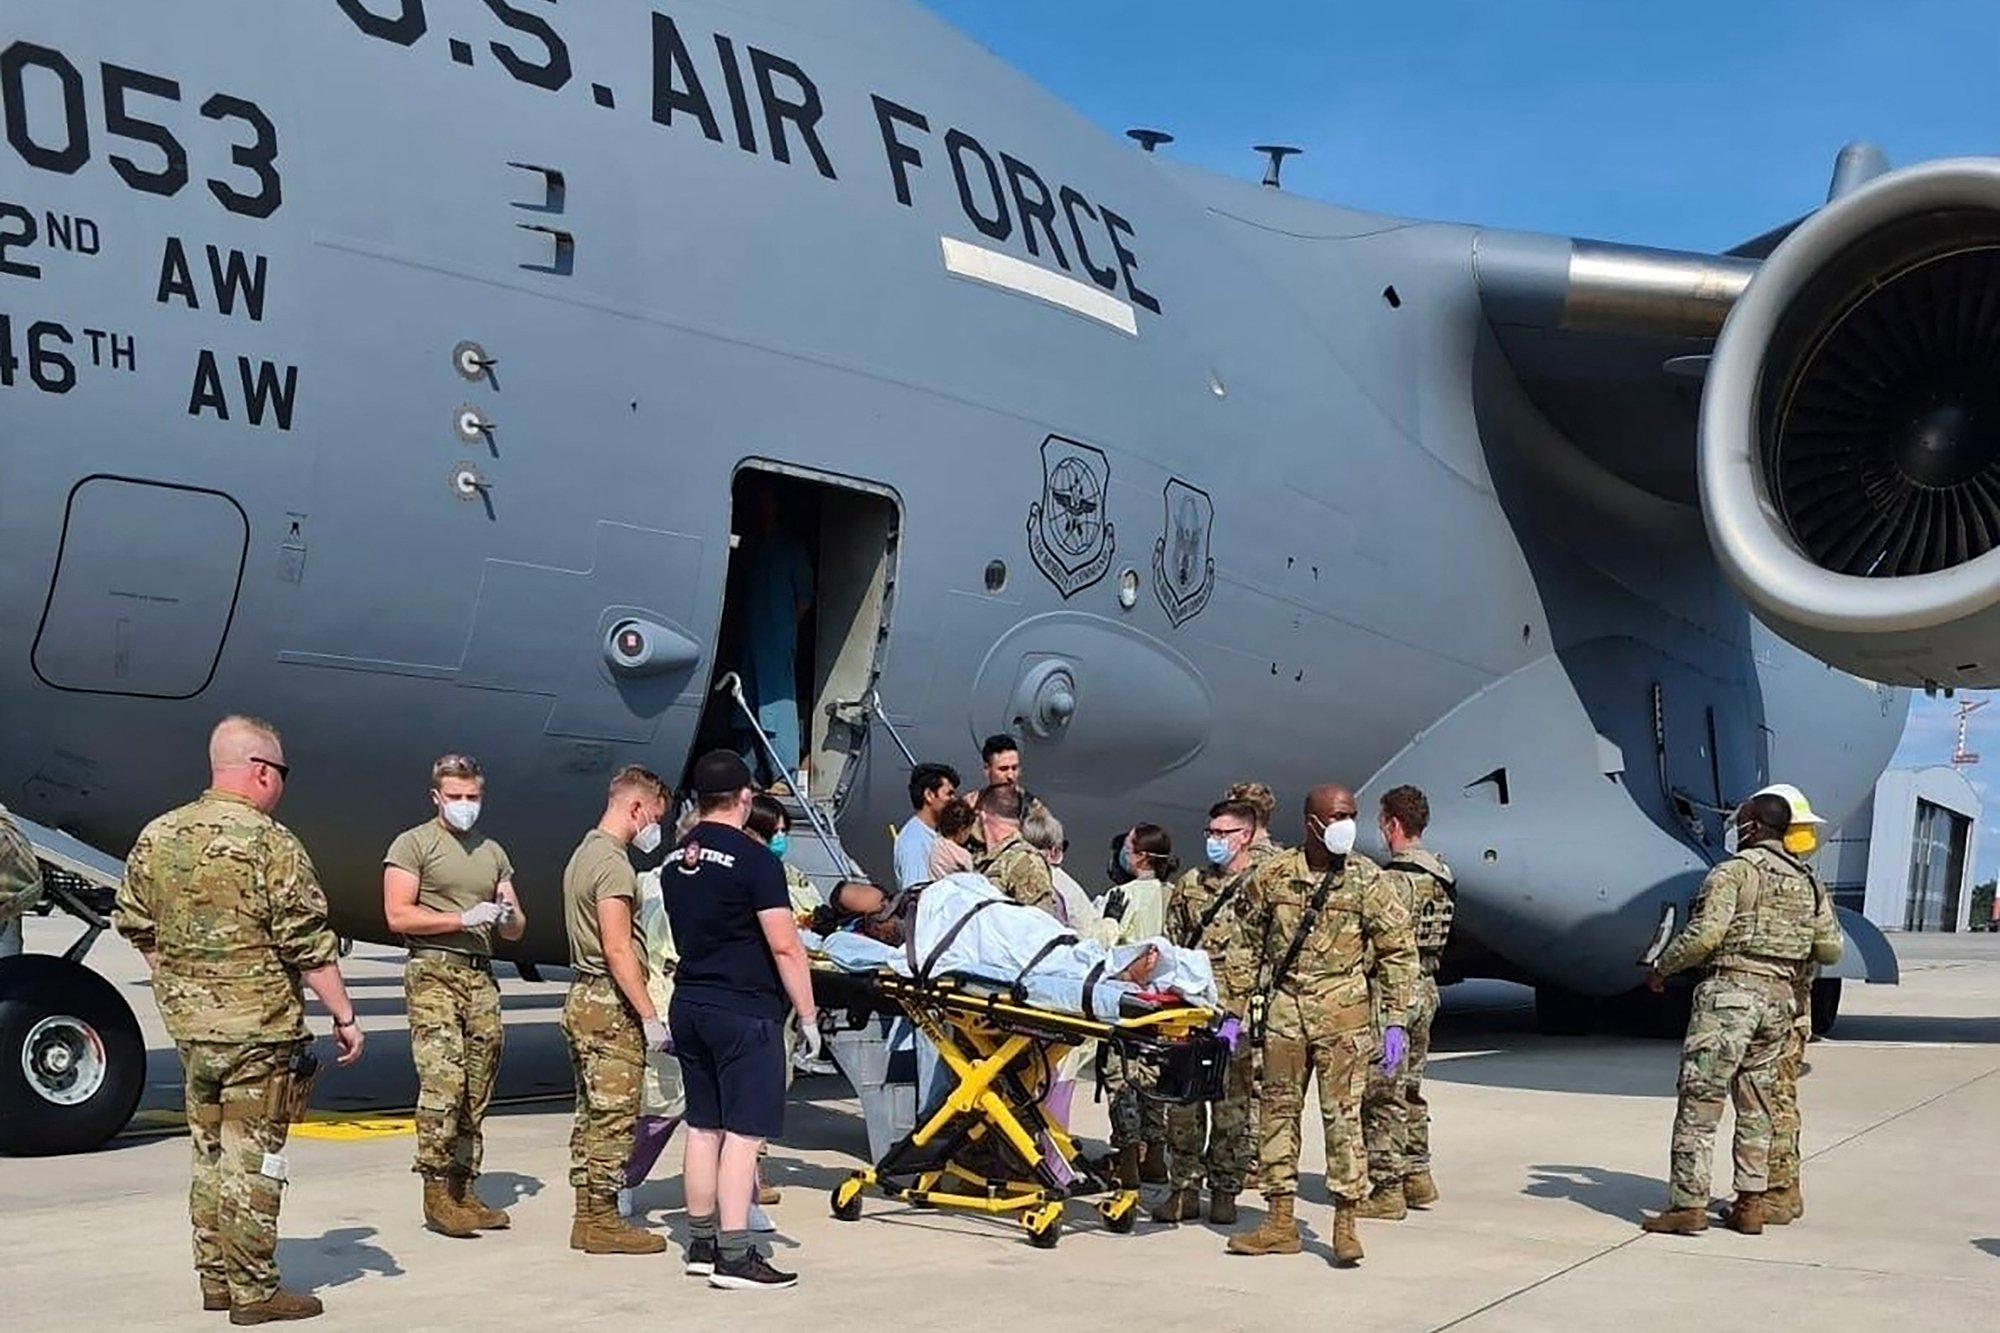 Afghan woman gives birth aboard U.S. evacuation plane